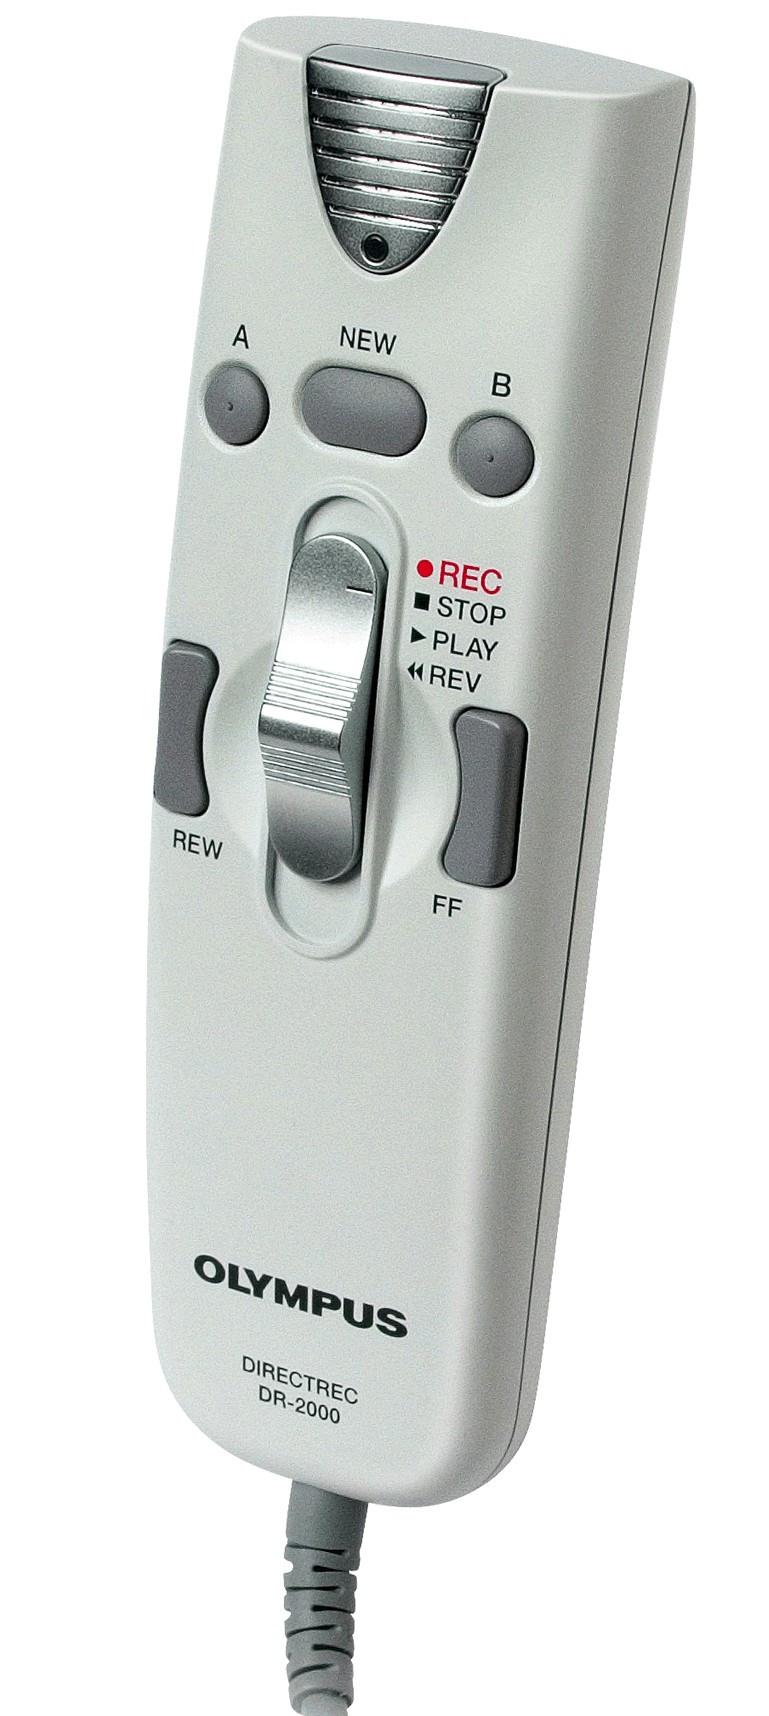 Olympus DR-2000 integrator